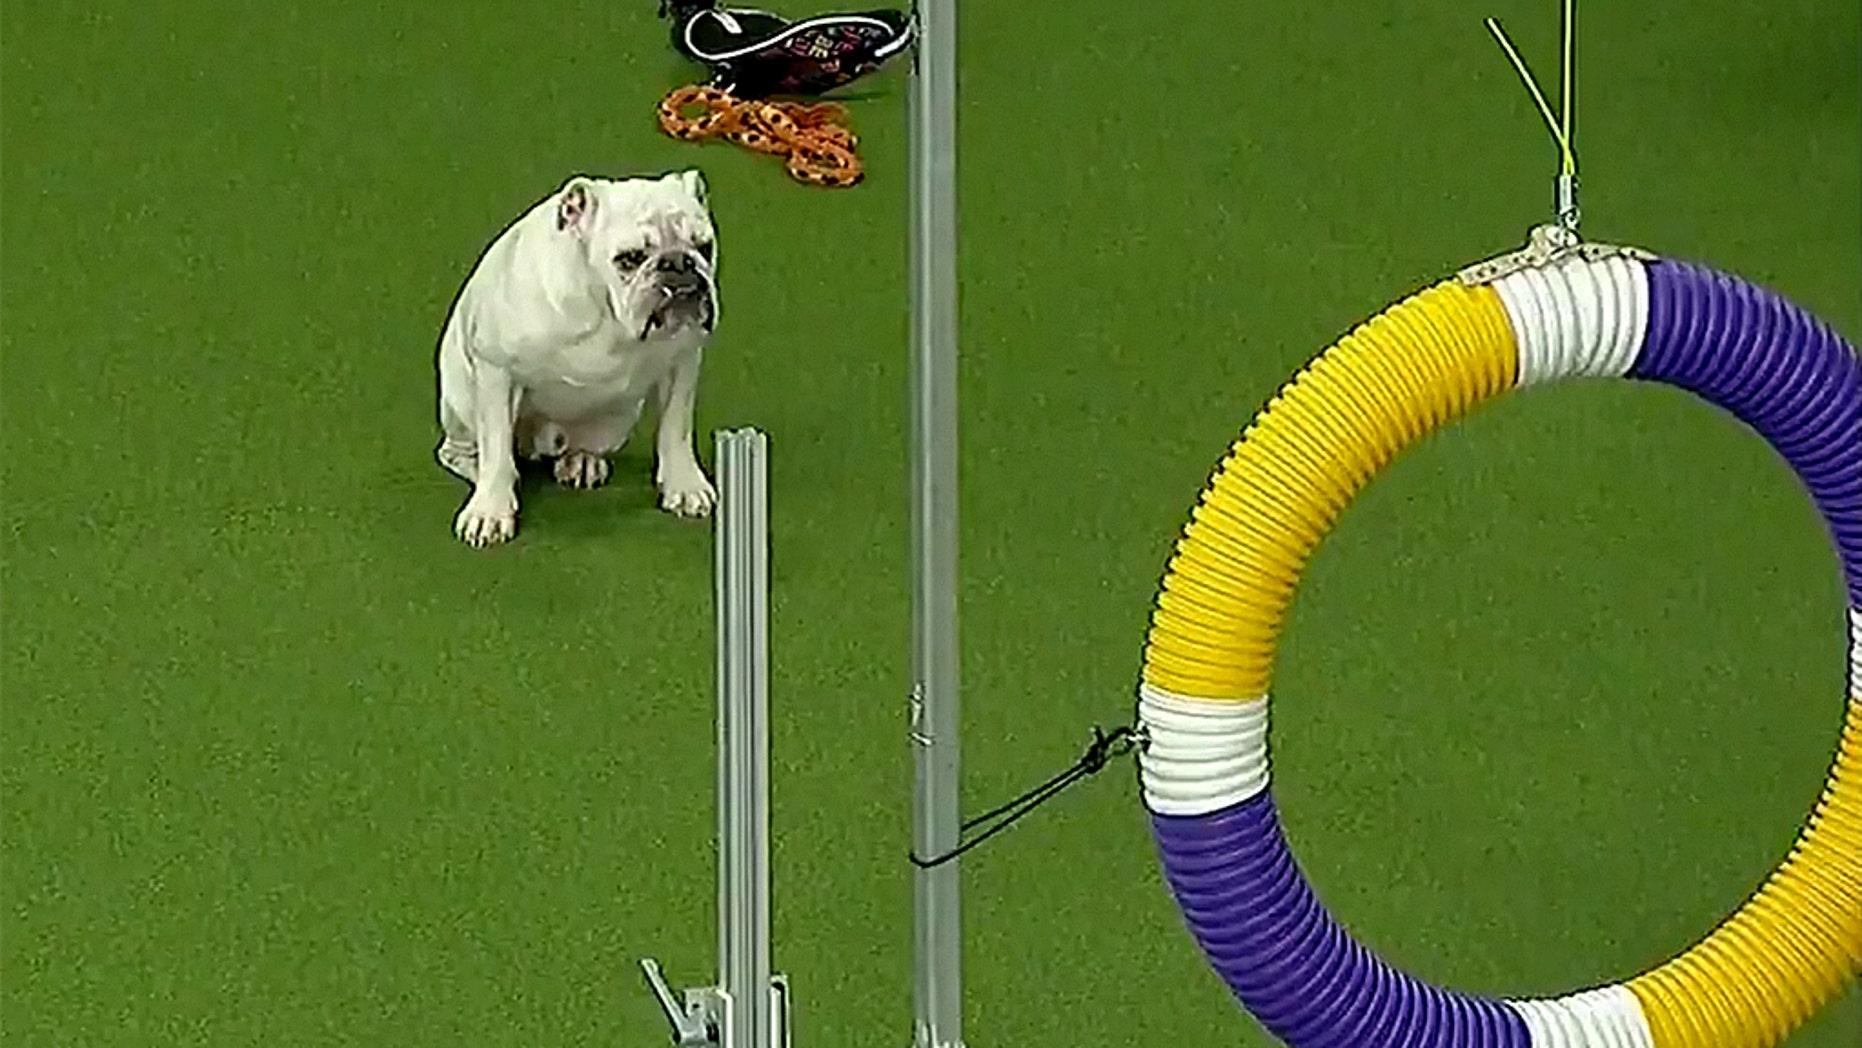 Rudy the bulldog. (Fox Sports)